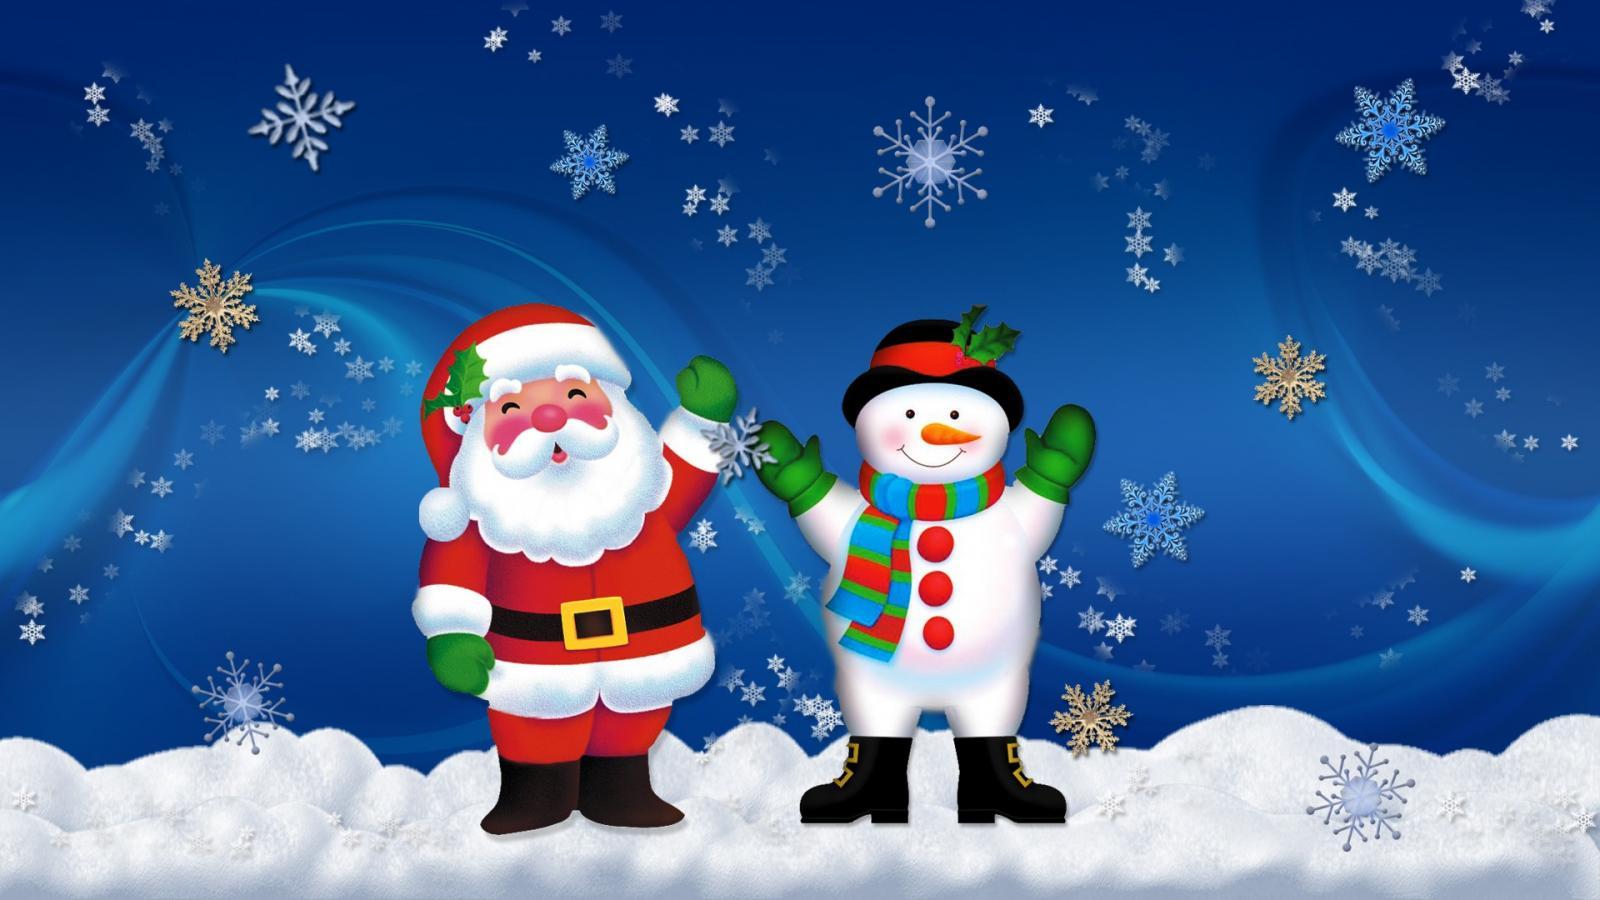 Christmas Merry HD Wallpapers 1600x900 Christmas Wallpapers 1600x900 1600x900